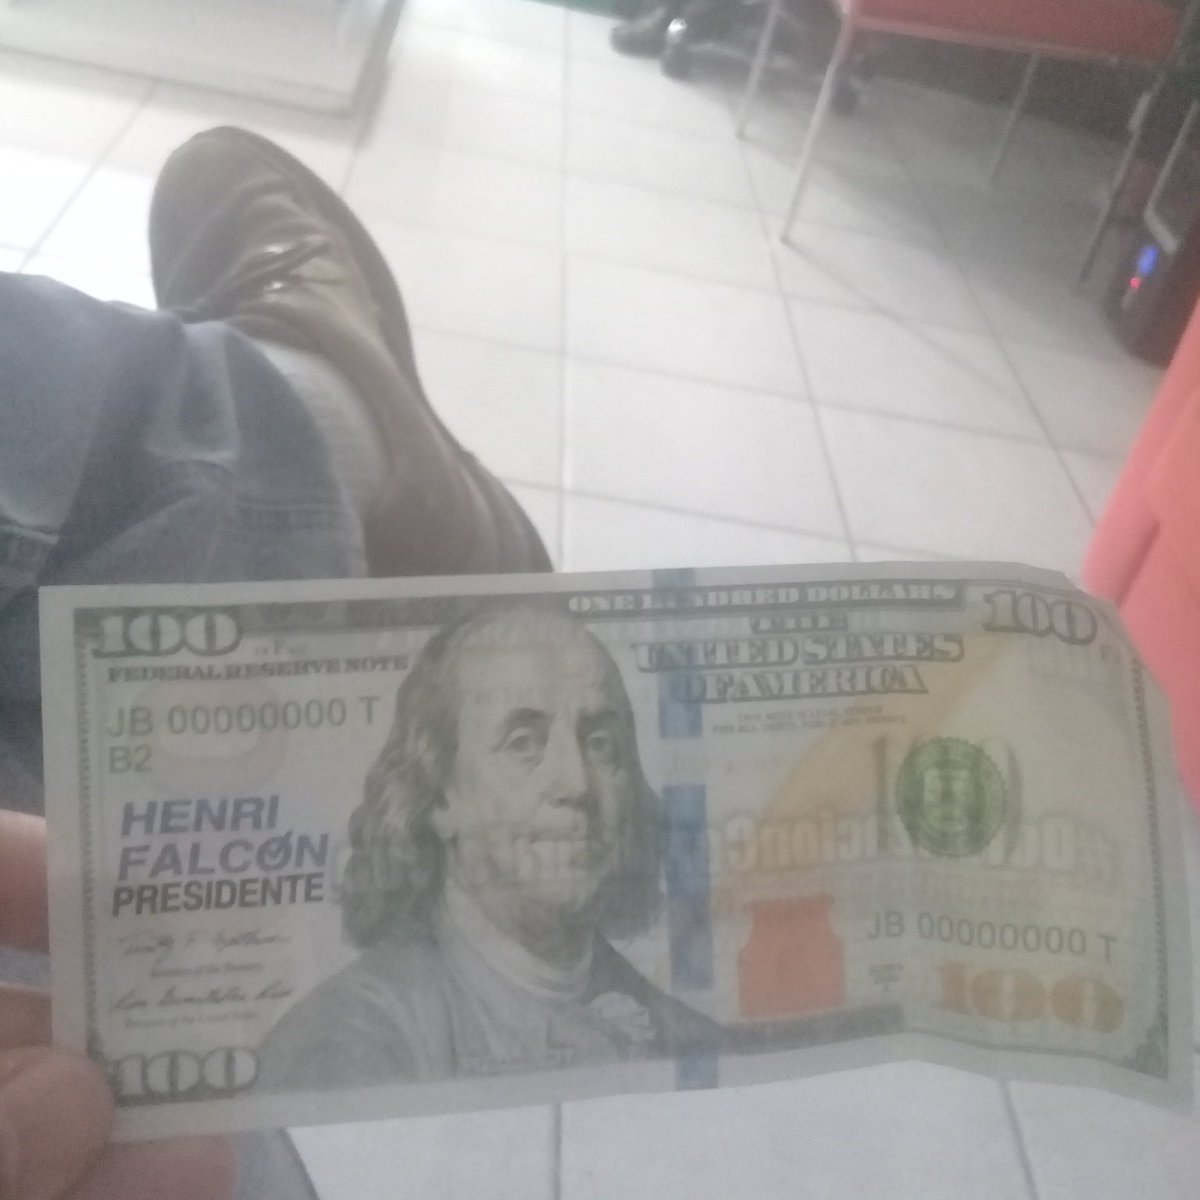 9May - Dictadura de Nicolas Maduro DcrodesXkAAO7W5